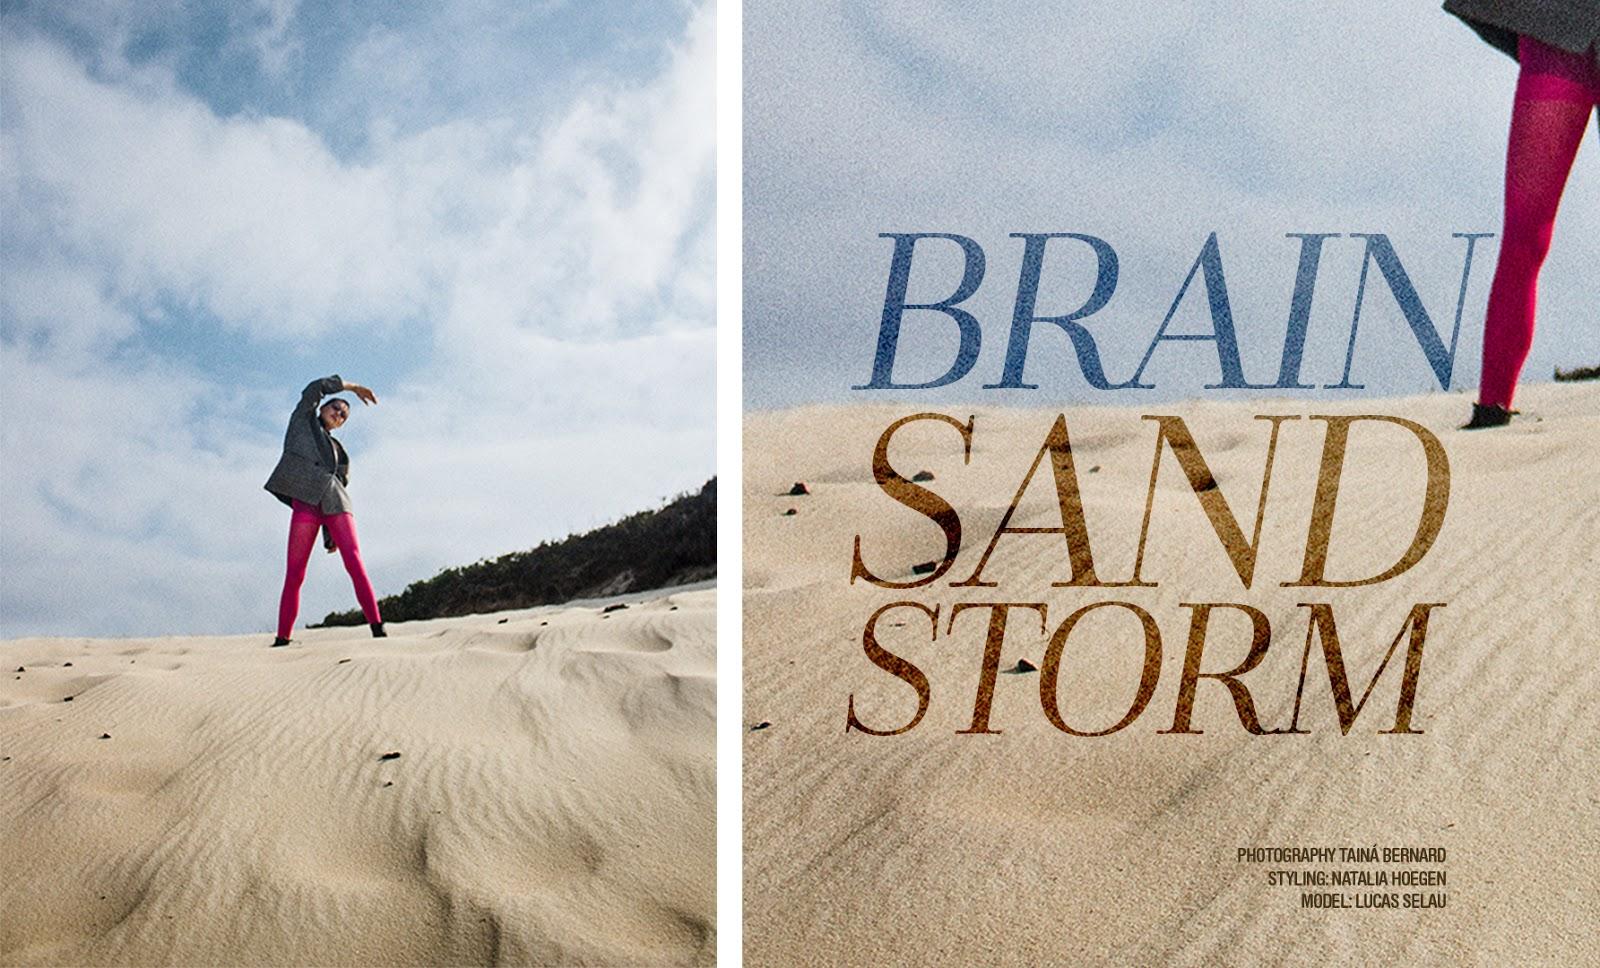 BRAIN SAND STORM